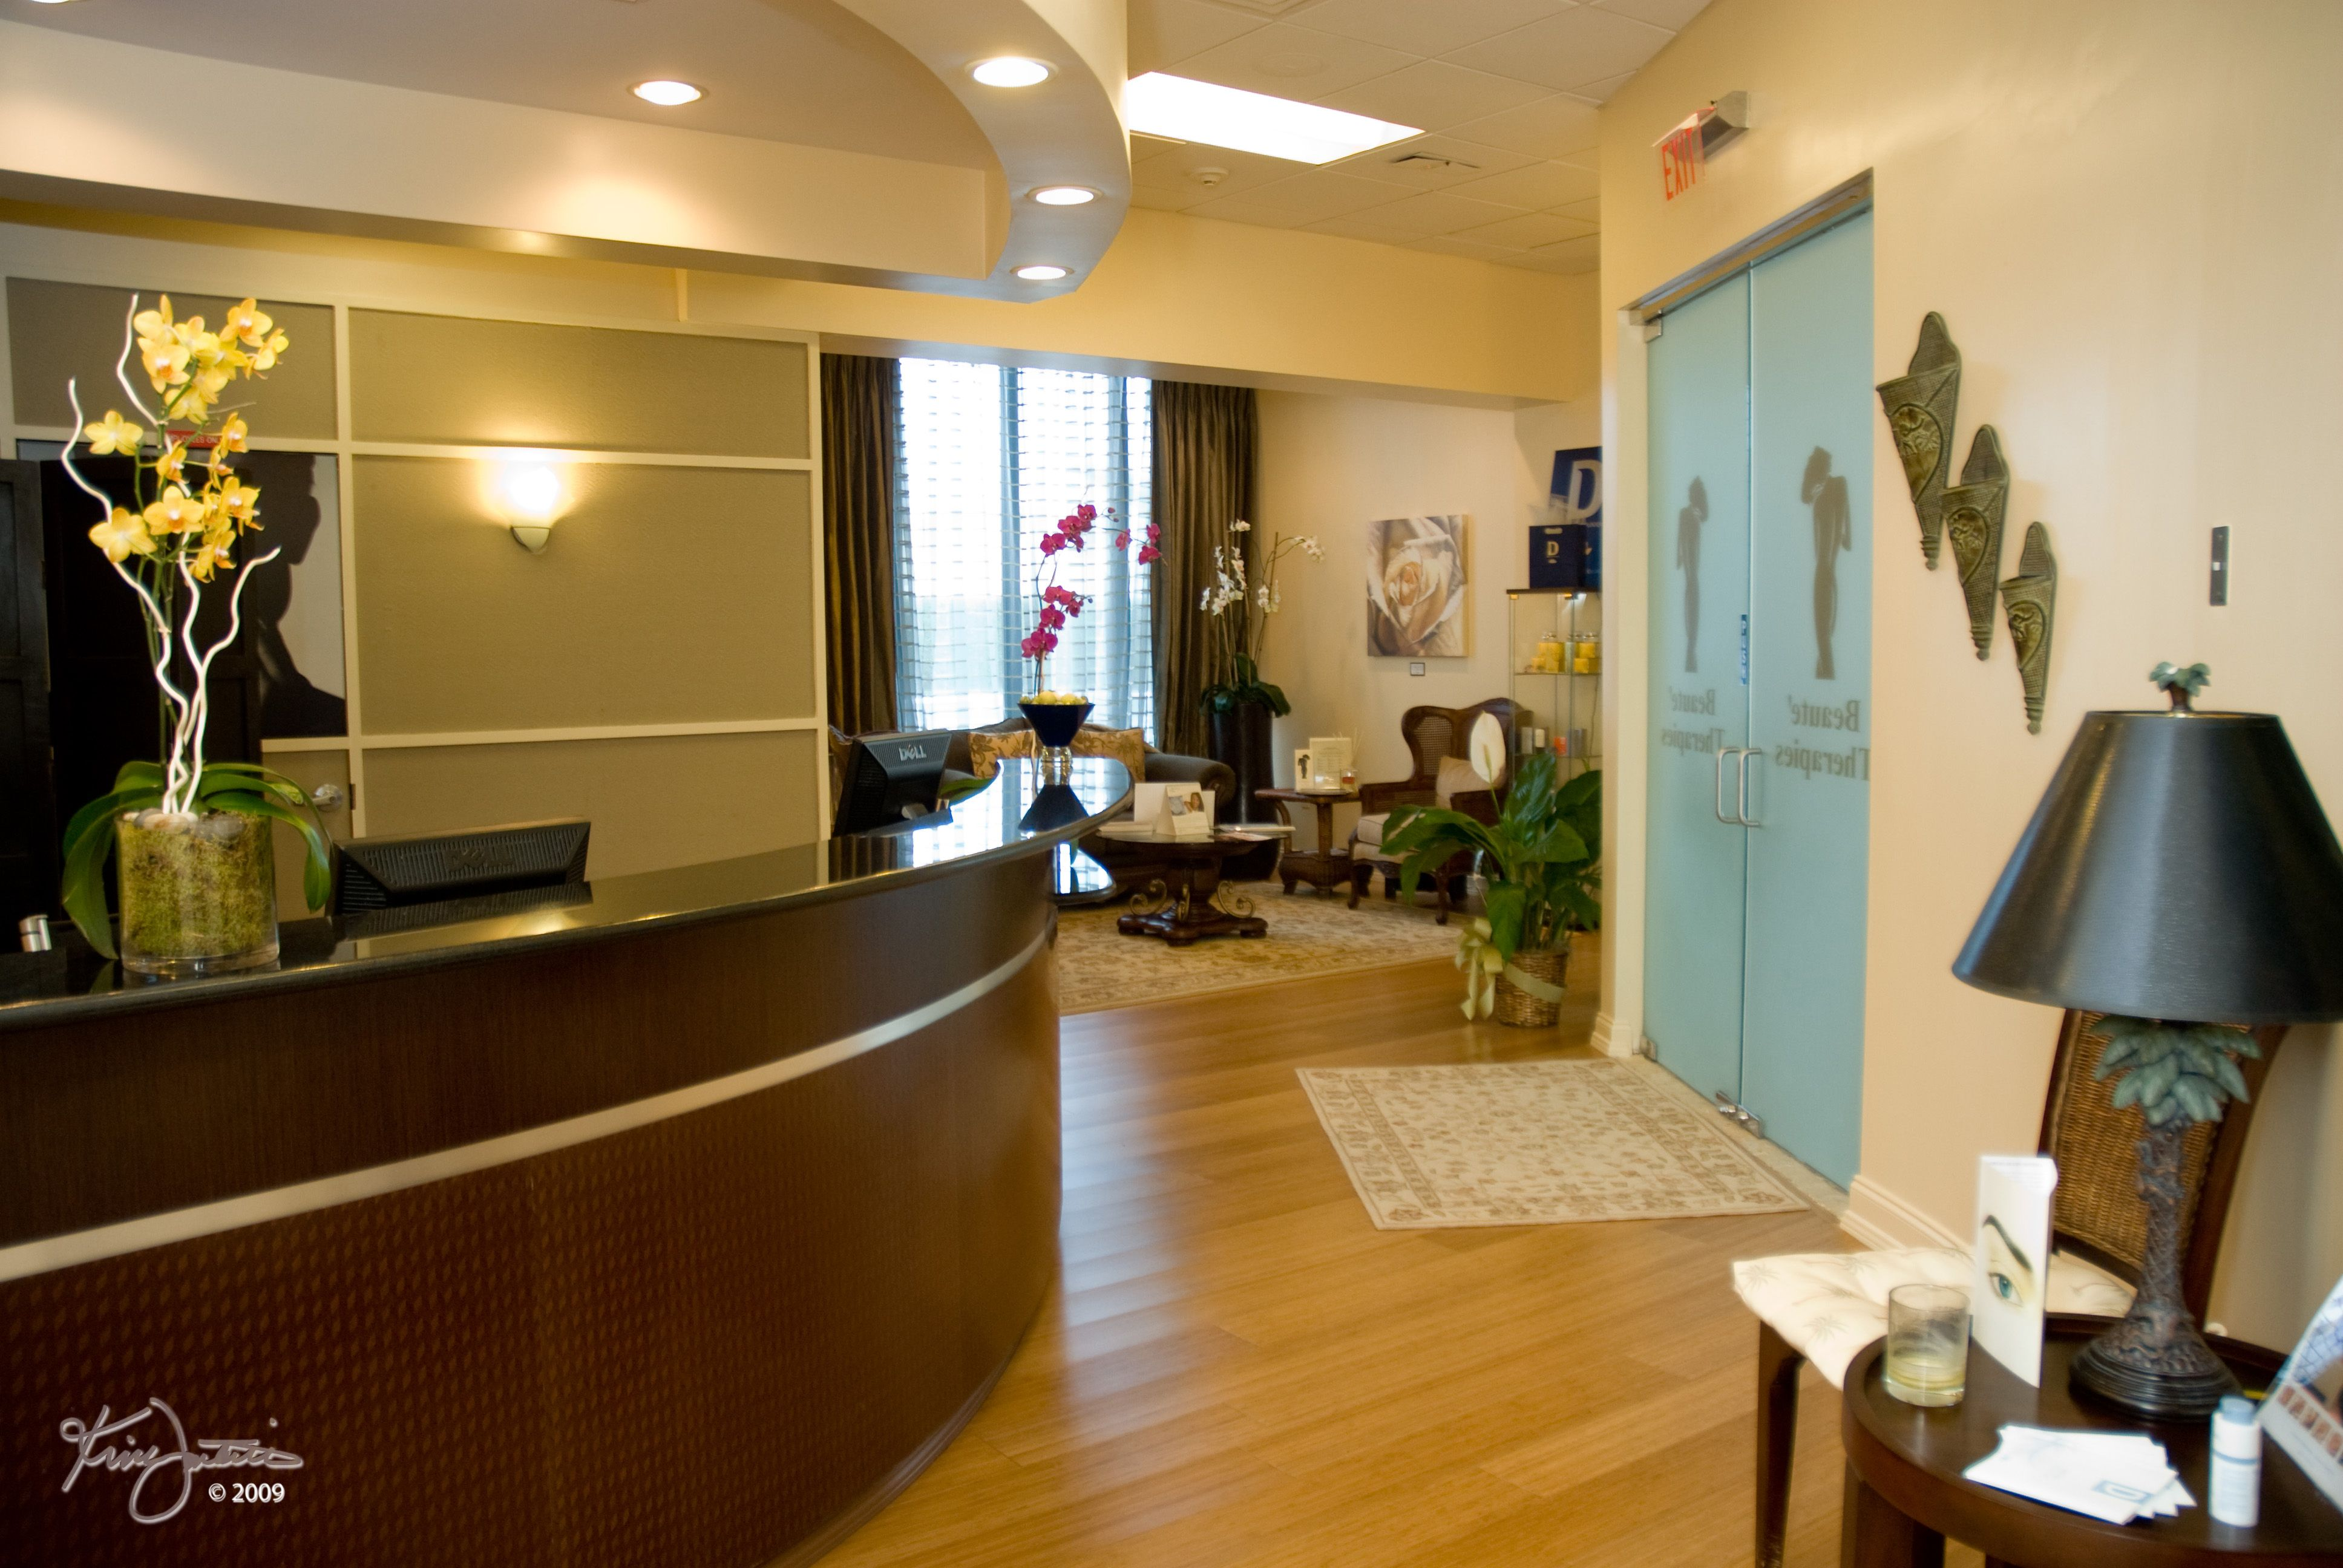 Doctors office interior